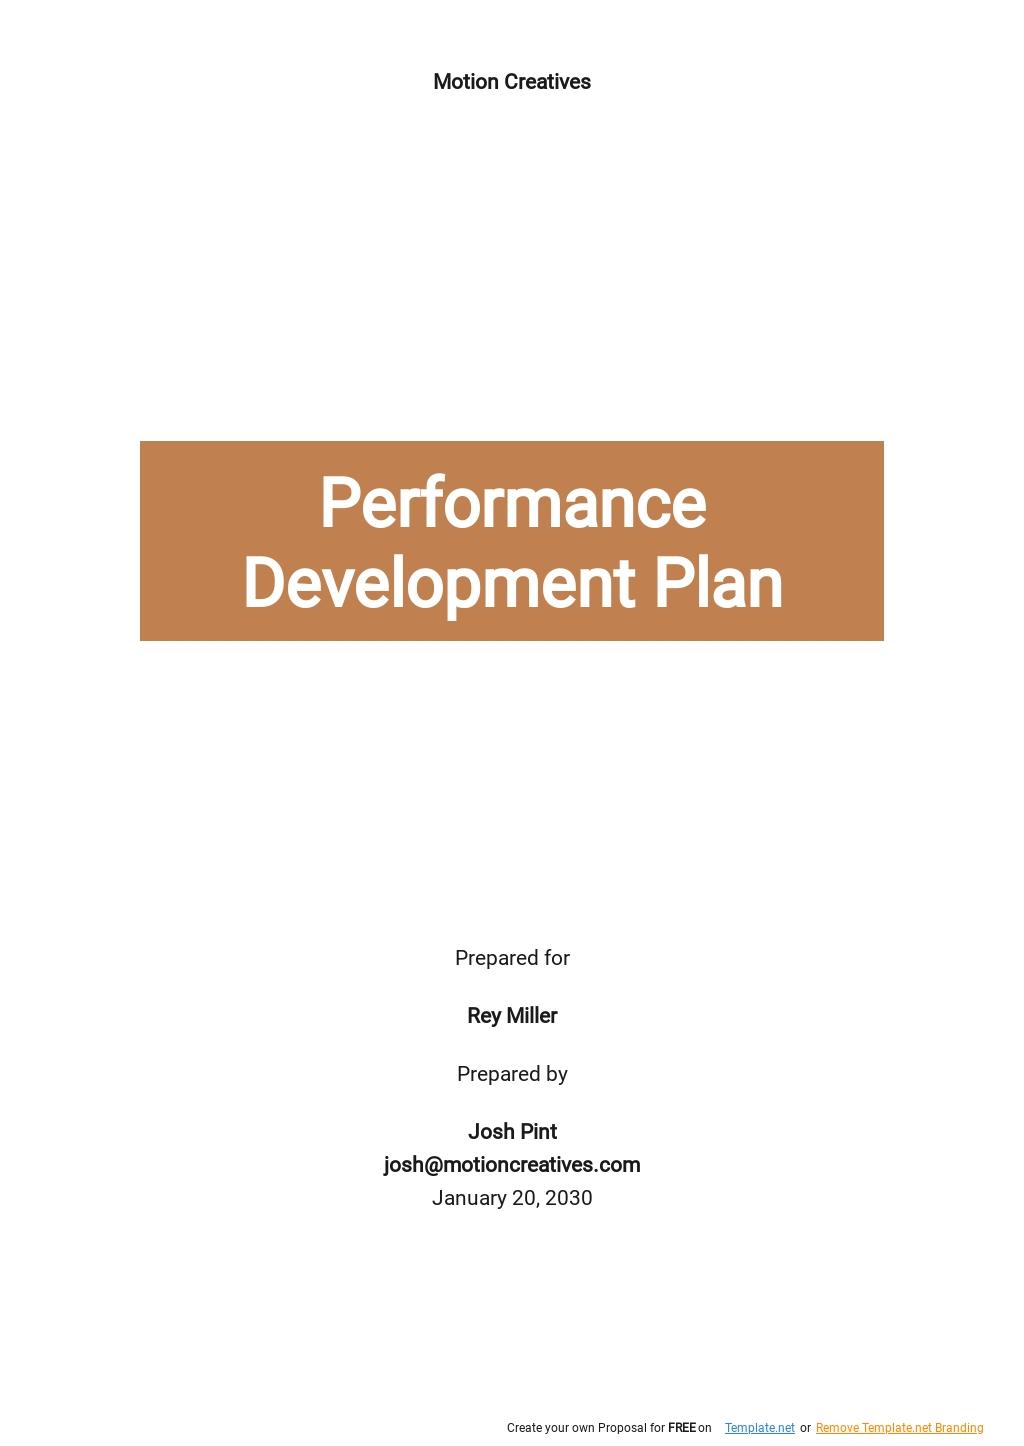 Performance Development Plan Template.jpe